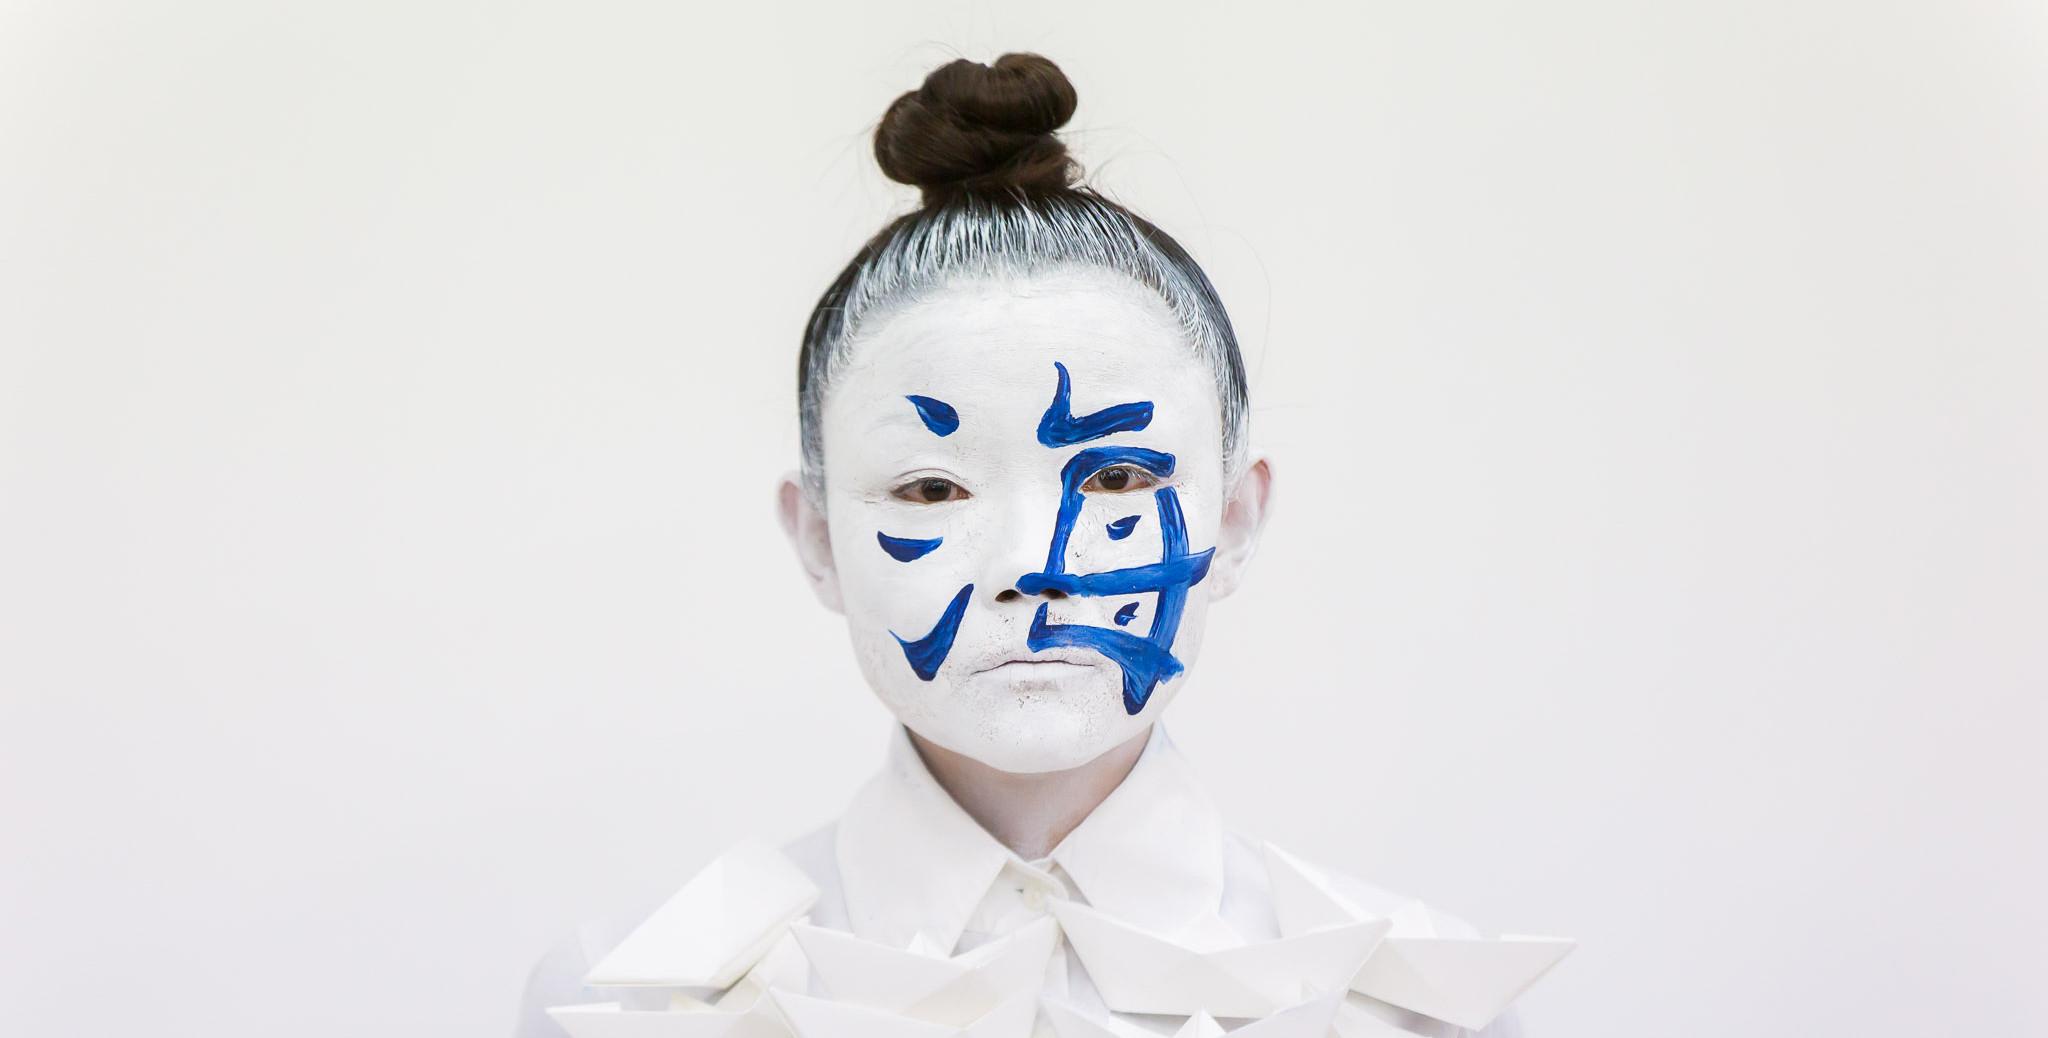 142_echo_morgan_-xie_rong-_52_artists_52